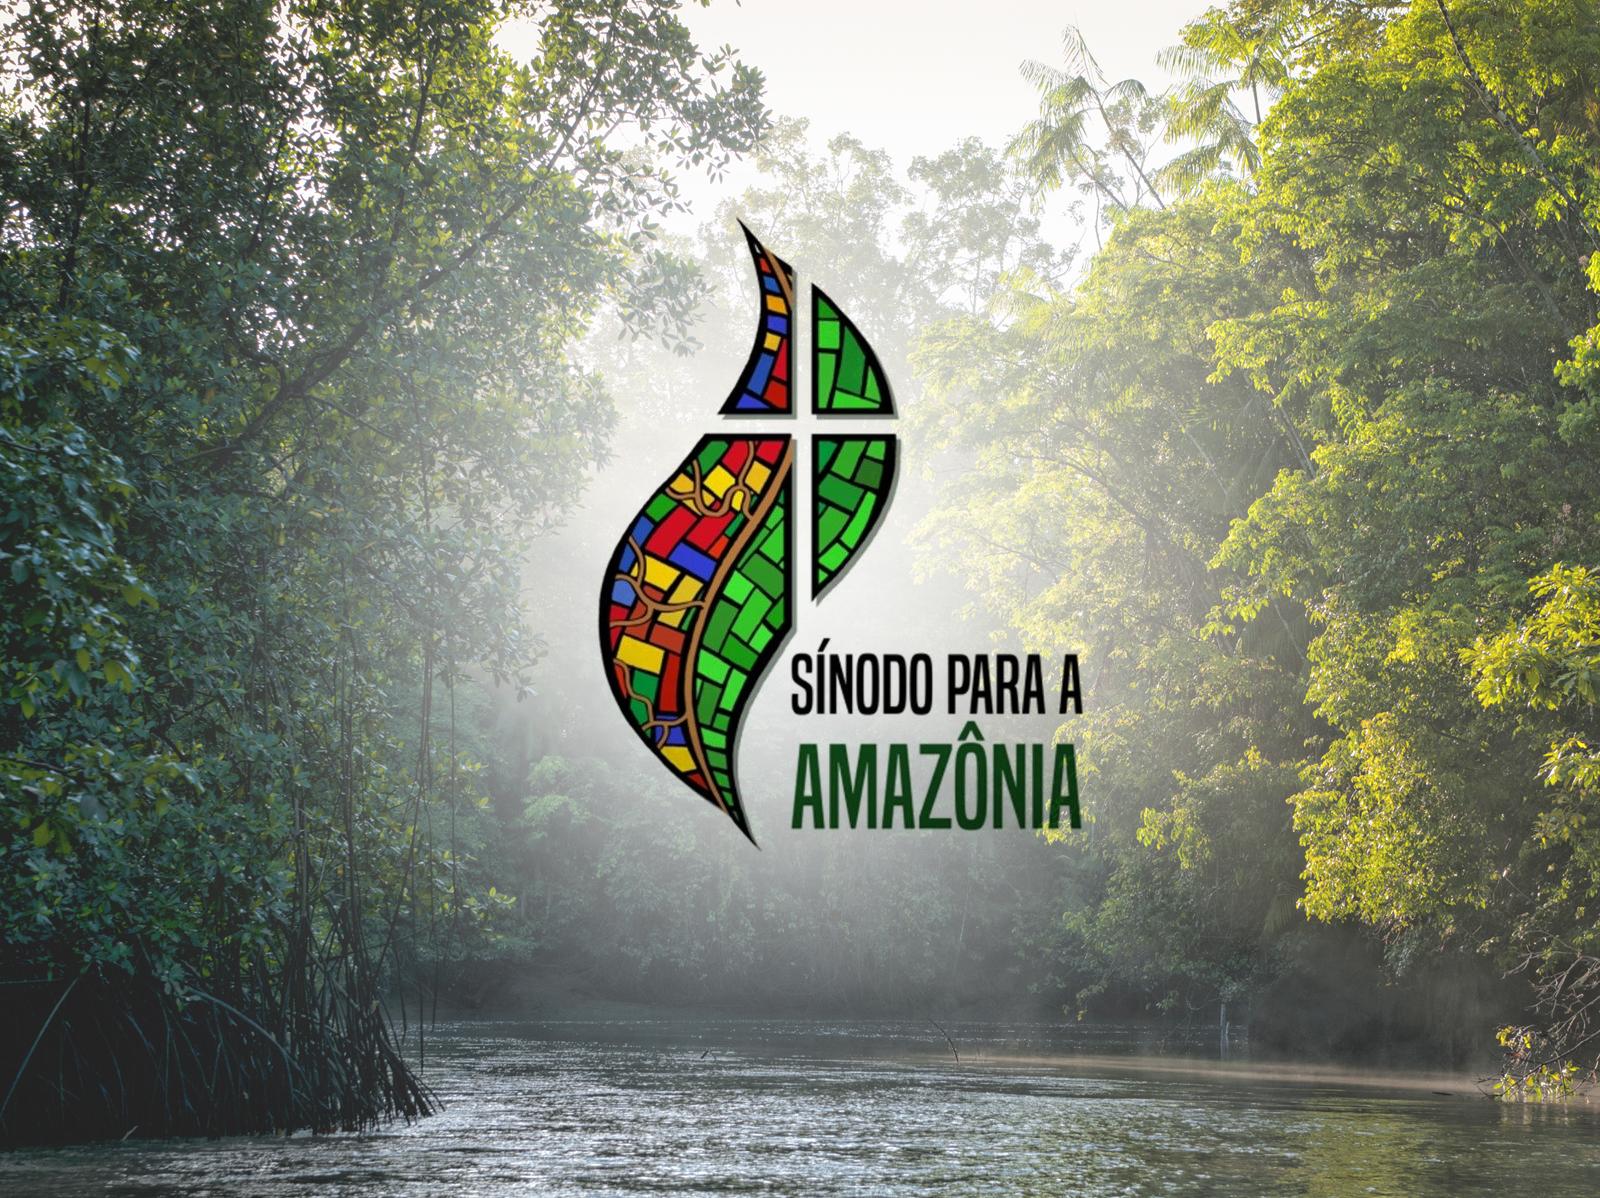 A verdade sobre o Sínodo da Amazônia